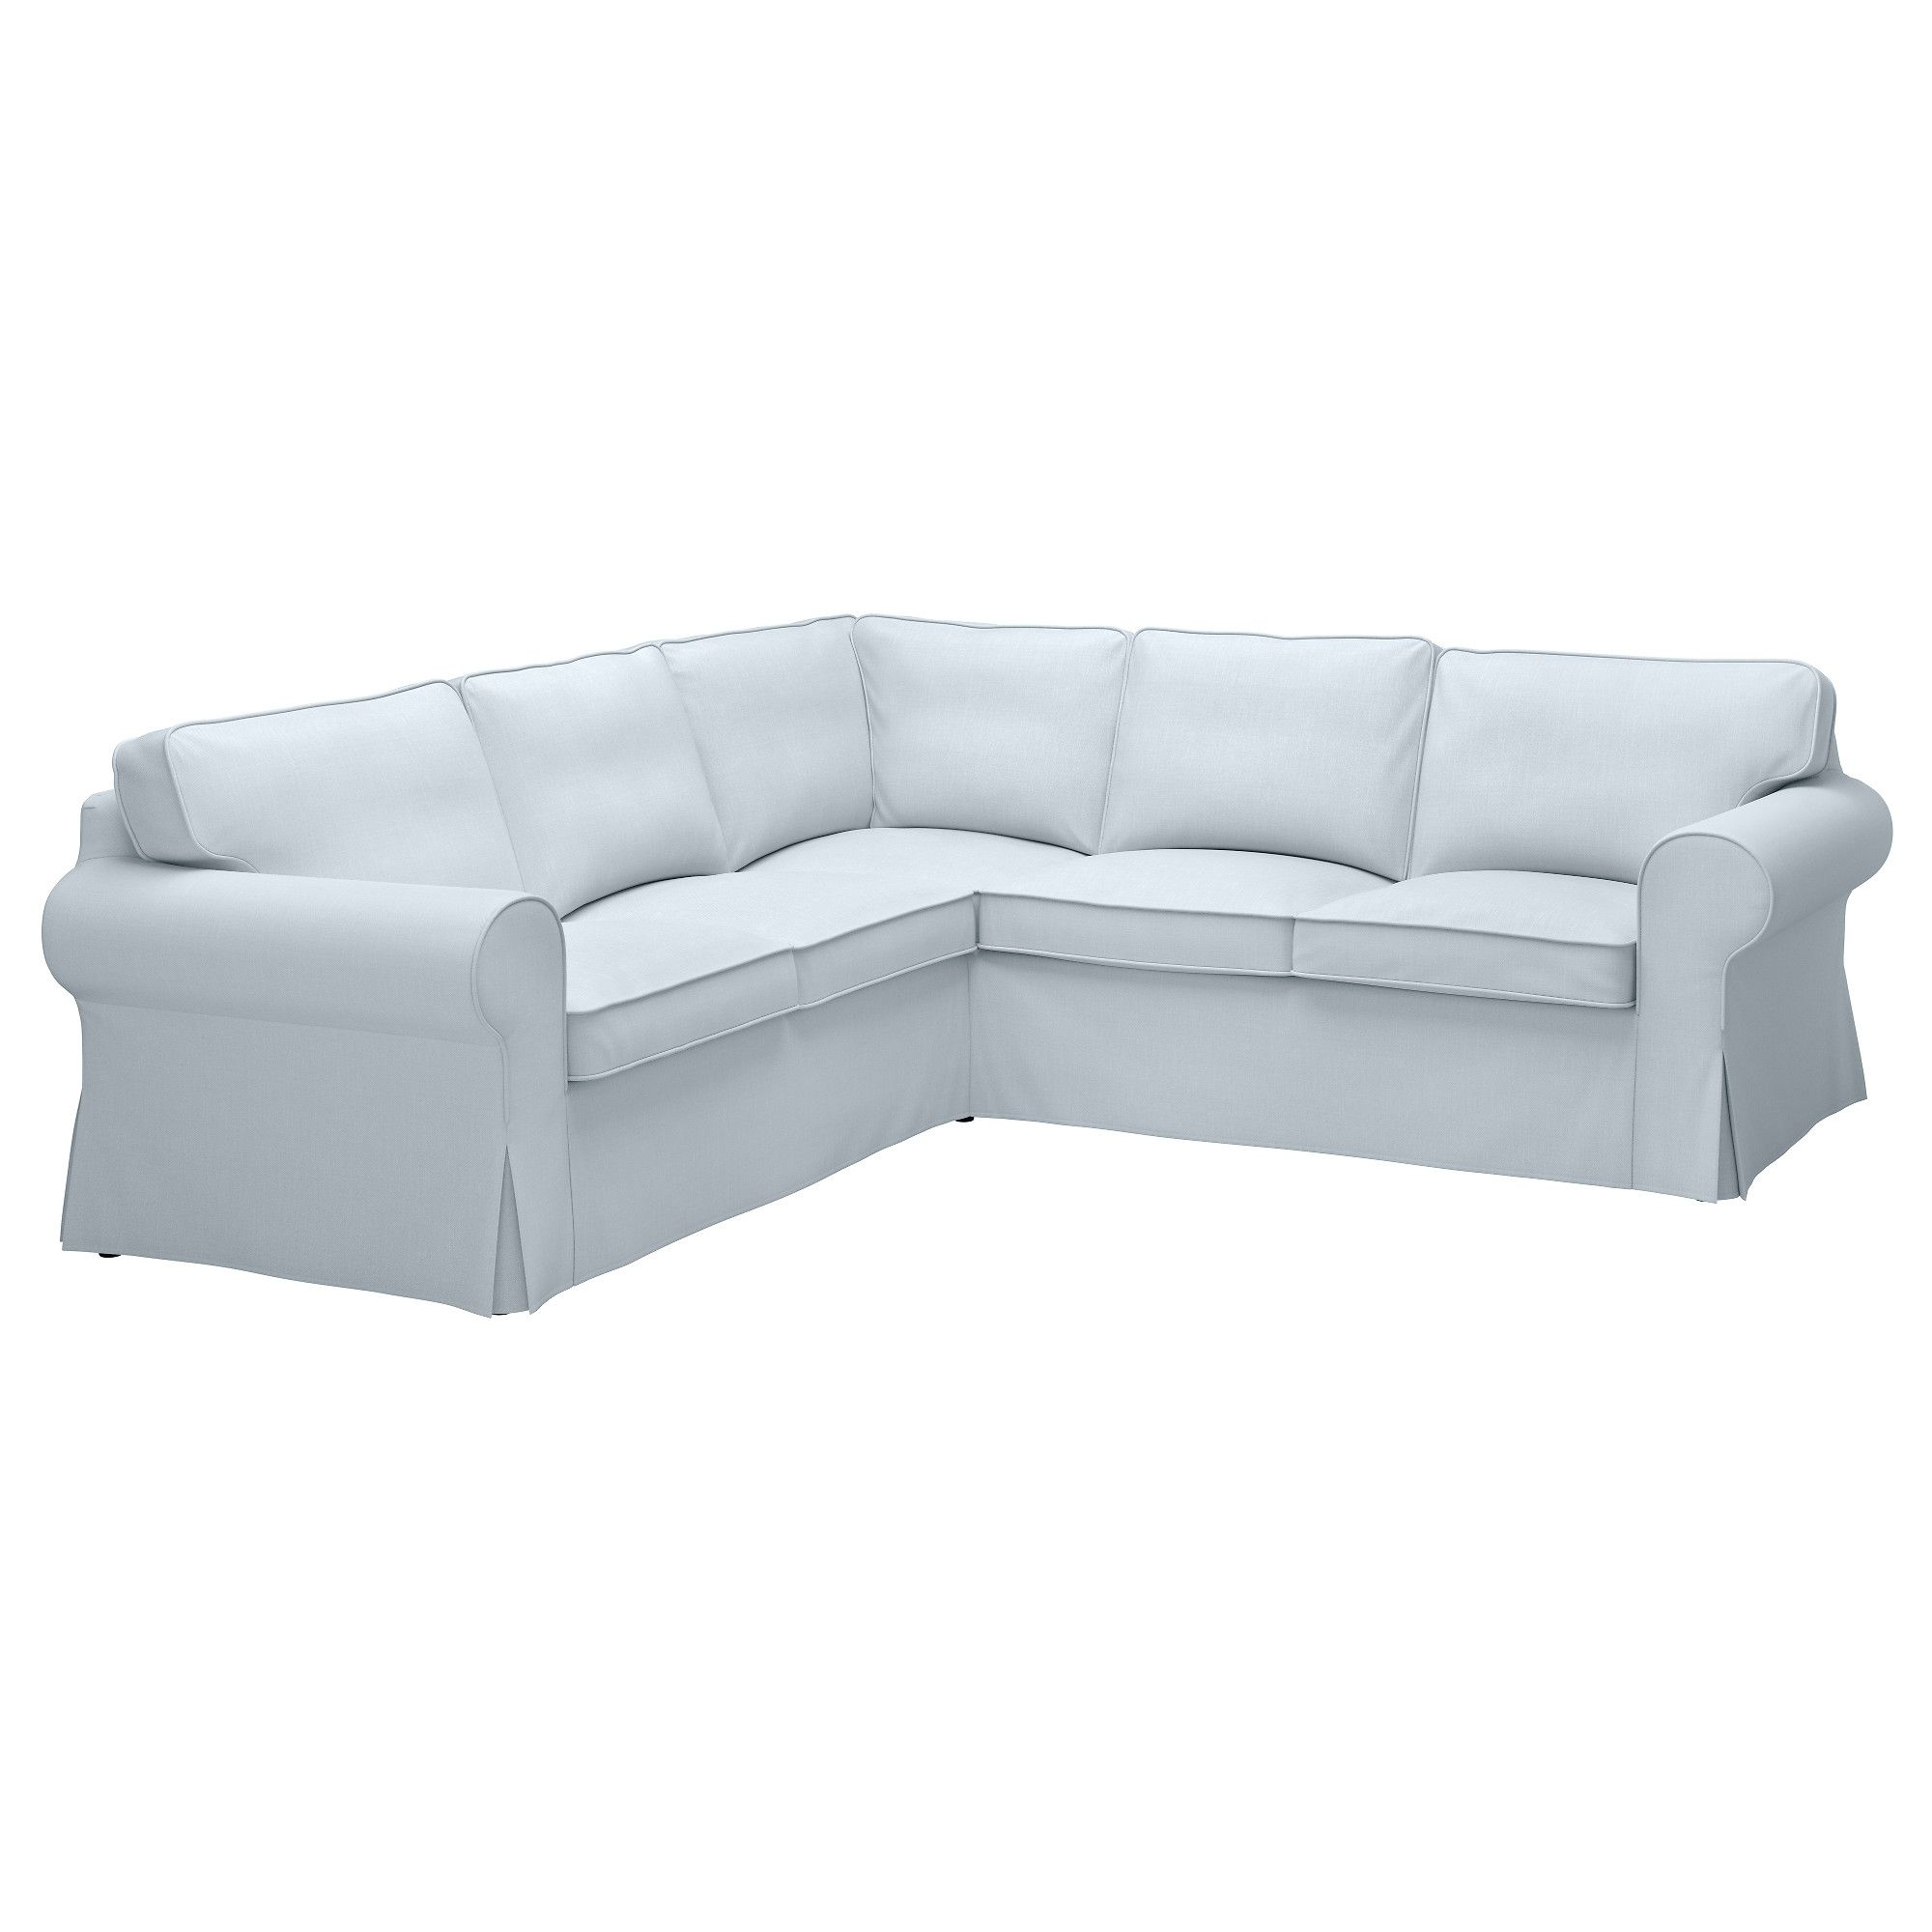 Ikea Ektorp Sofa Couch Cover Lofallet Beige